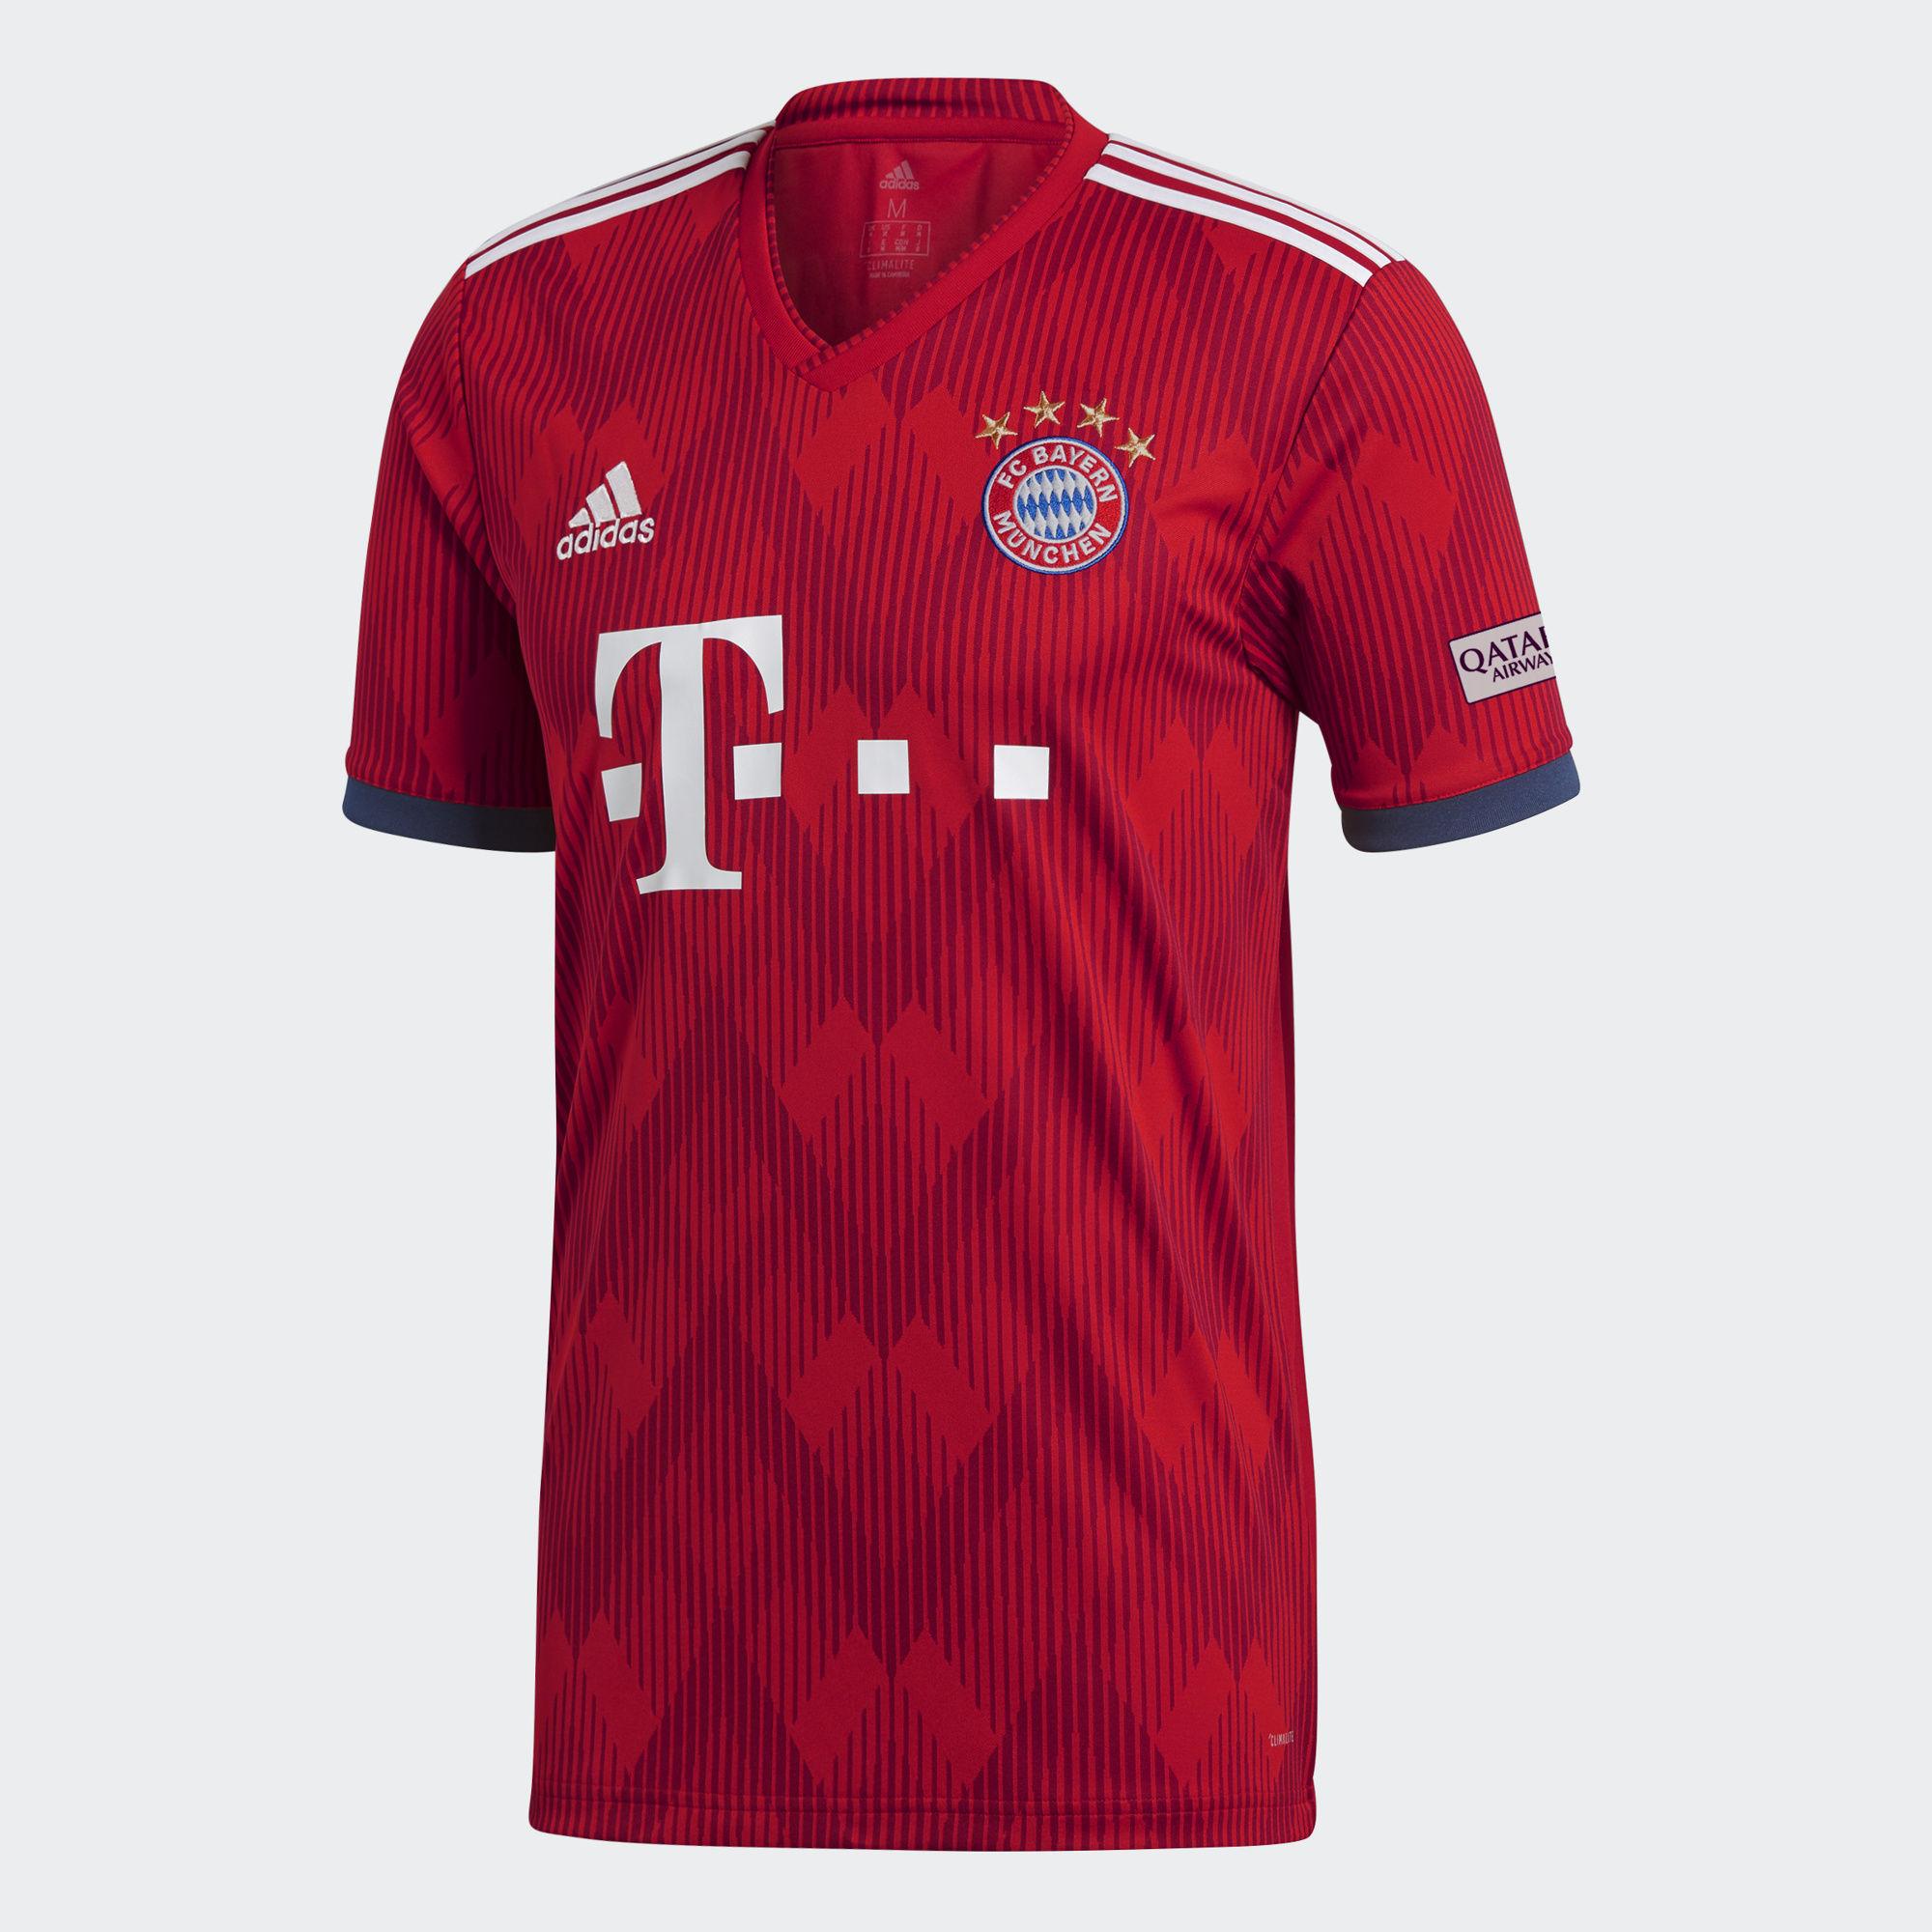 0e2c5abb090d0 Camiseta del Bayern (ADIDAS).